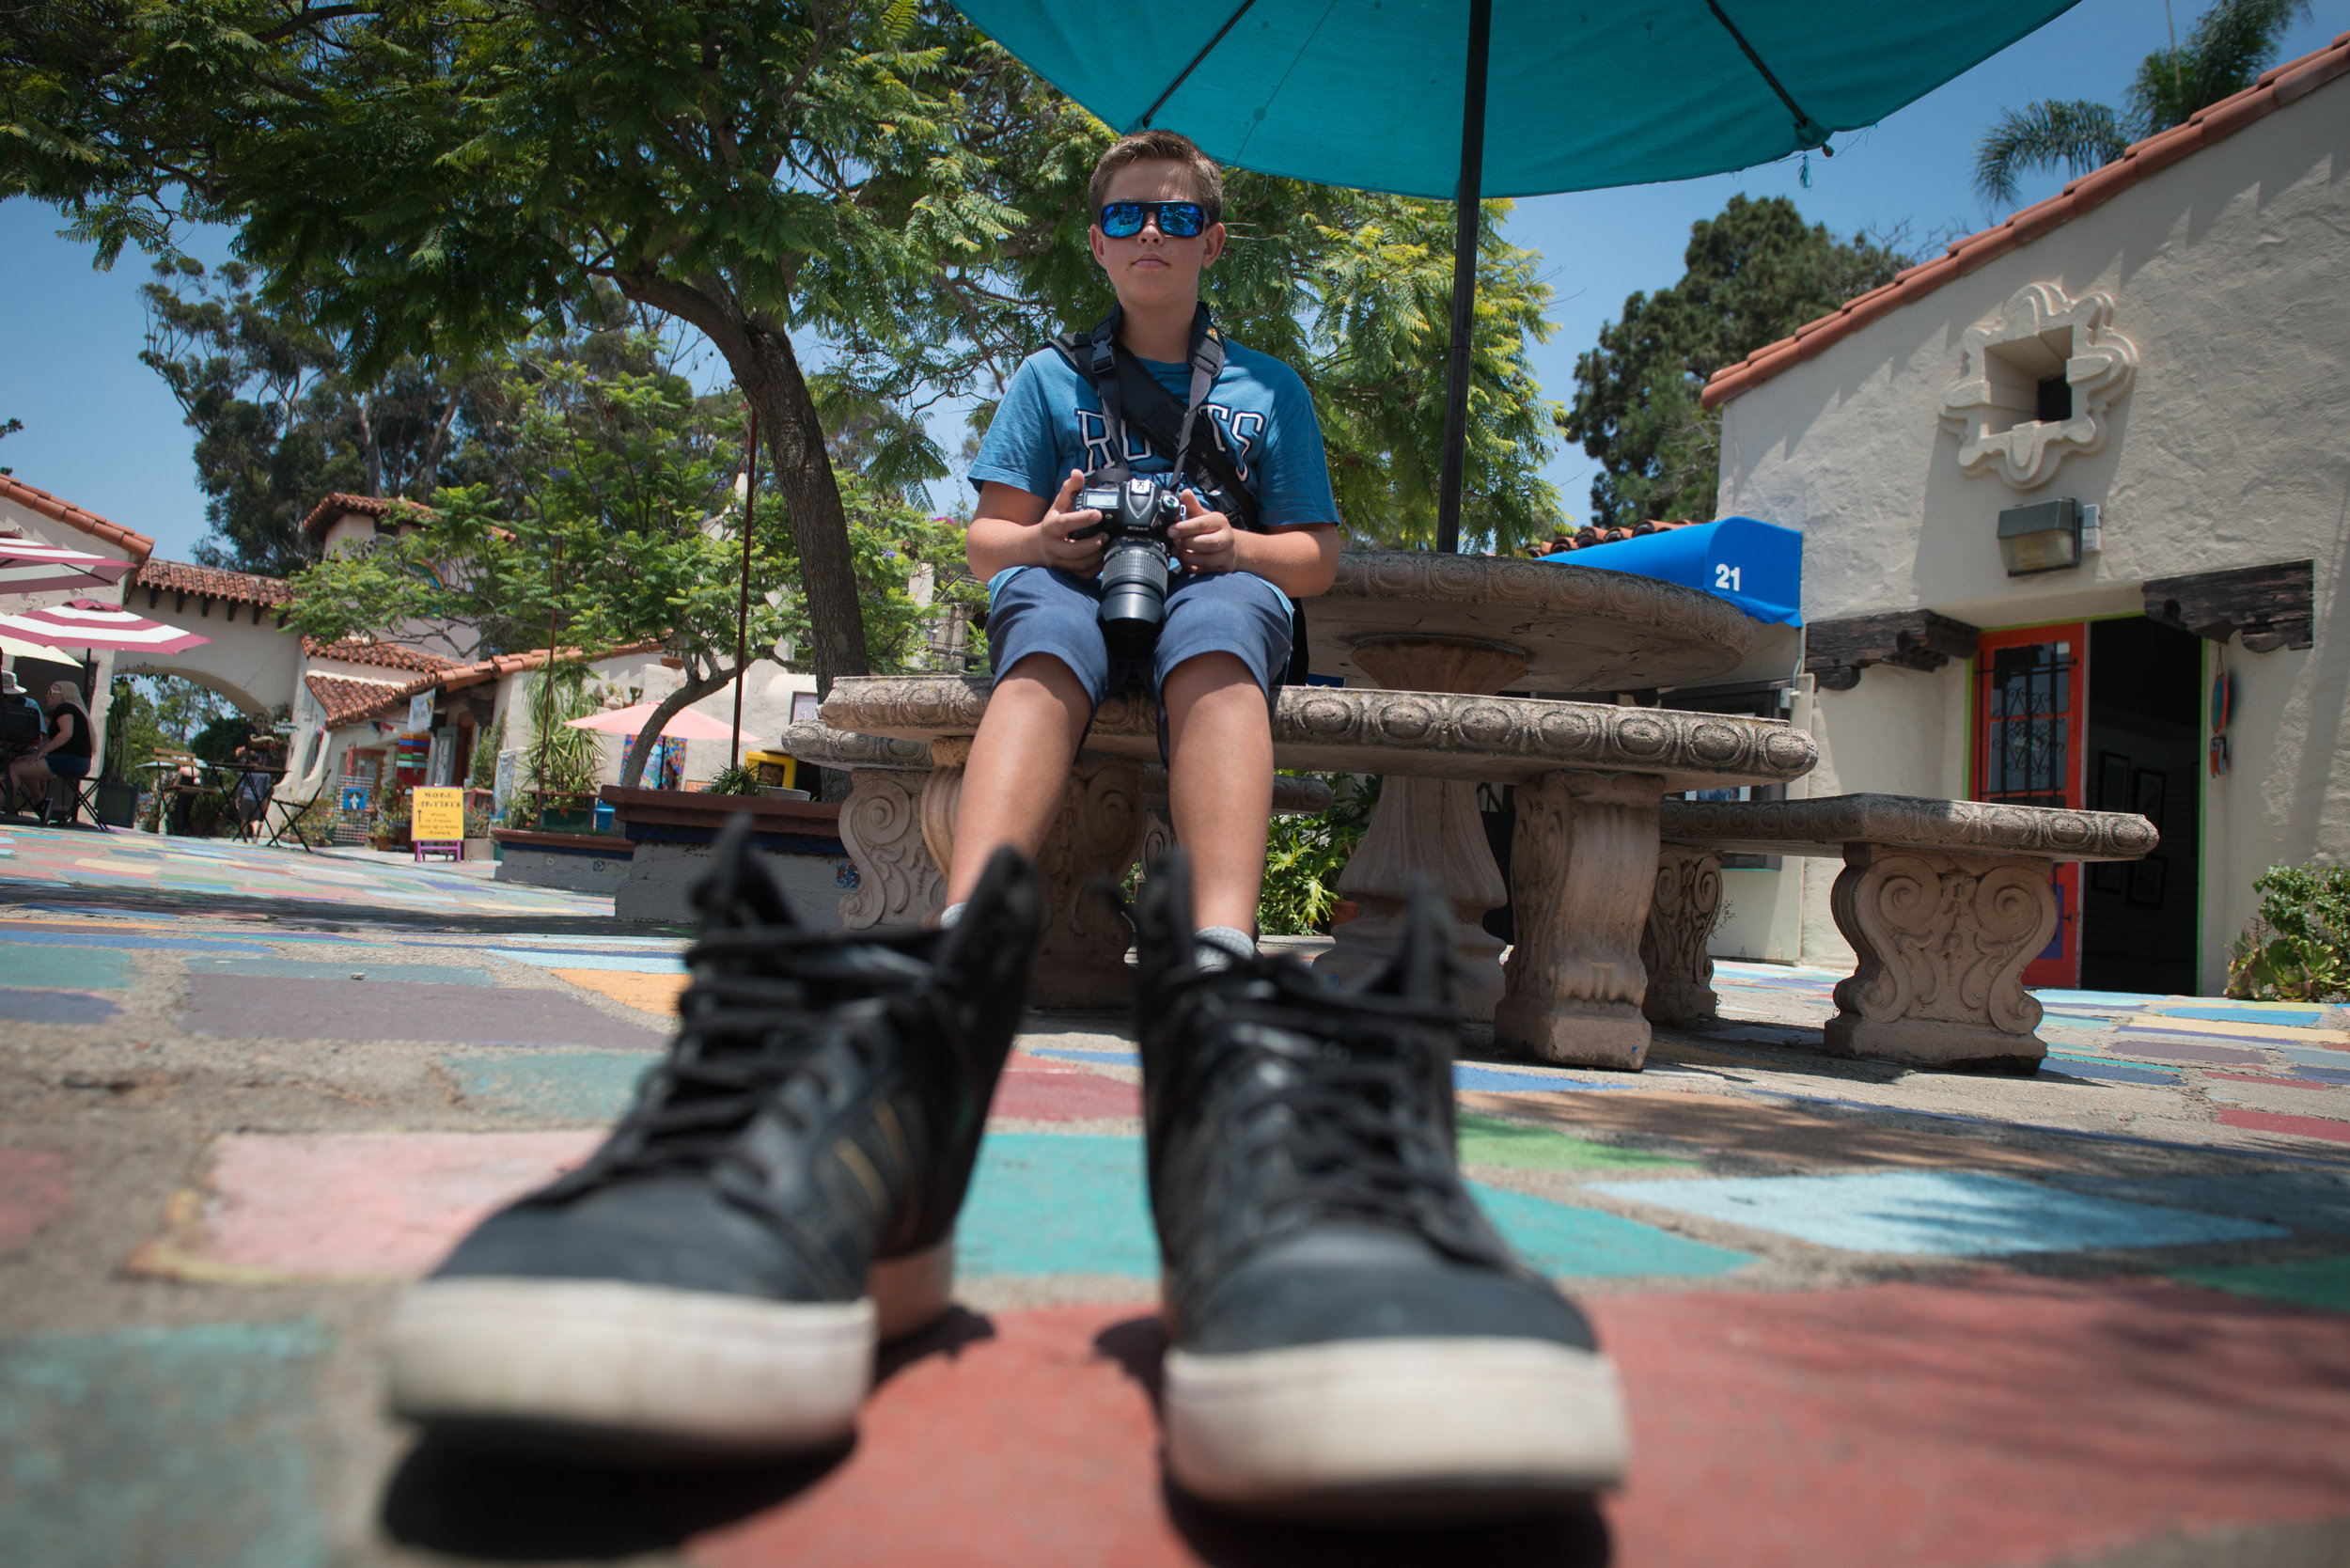 San Diego Kids Summer Art Camp Balboa Park 2017-61.jpg